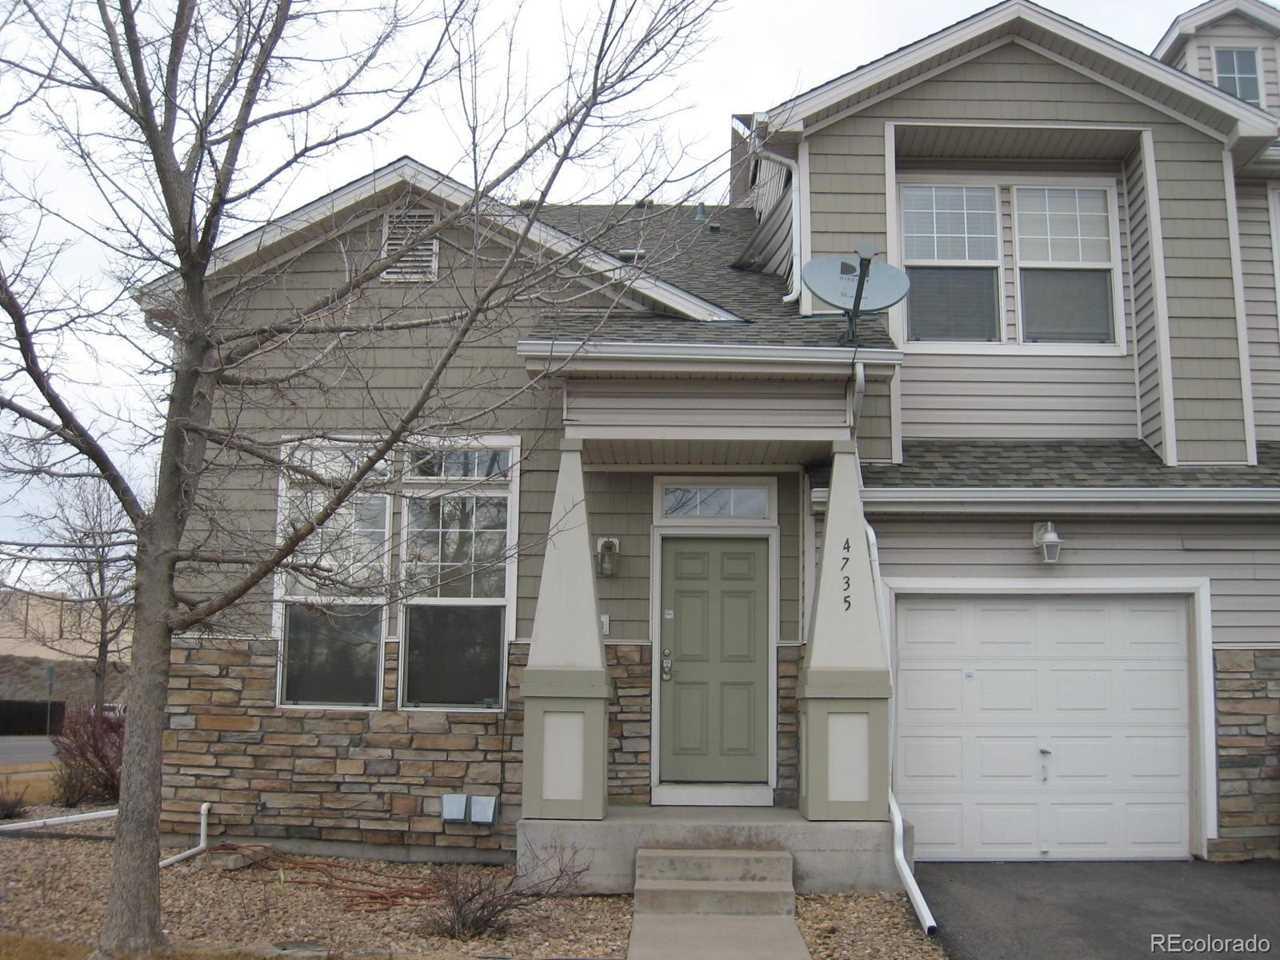 4735 Flower Street Wheat Ridge, CO 80033   MLS ® 4708502 Photo 1